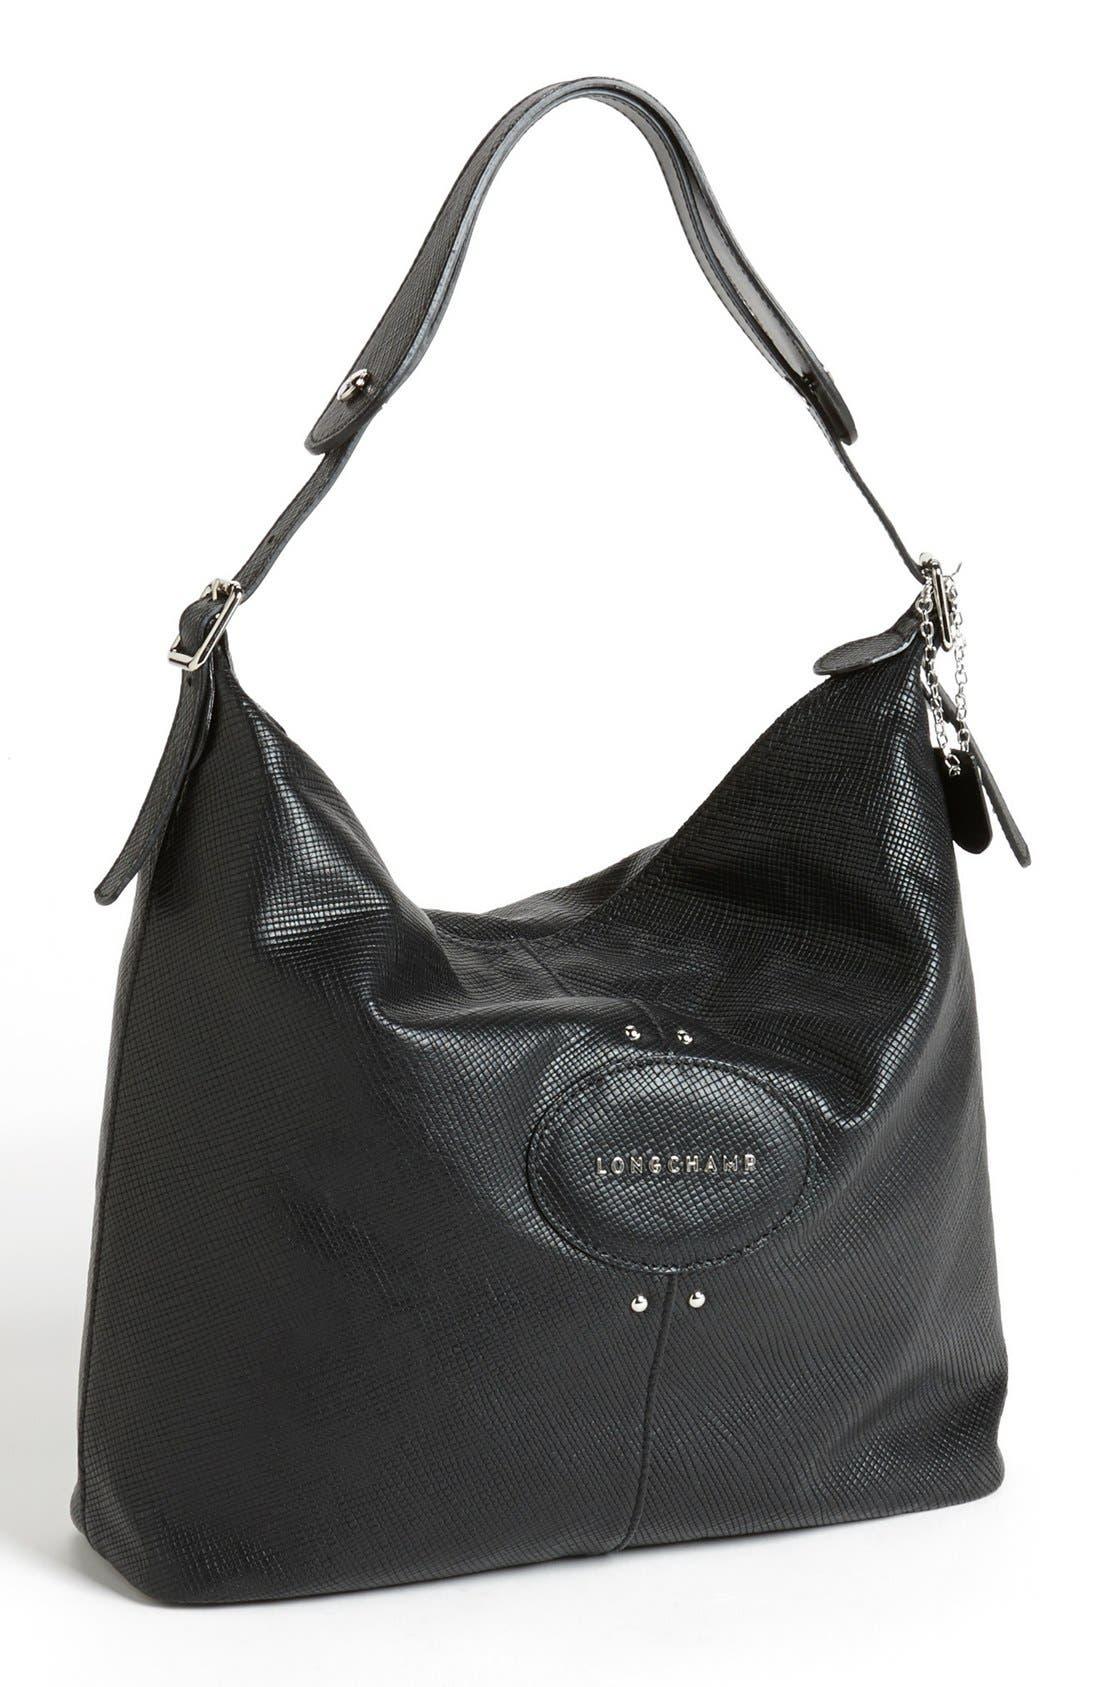 Main Image - Longchamp 'Quadri' Hobo